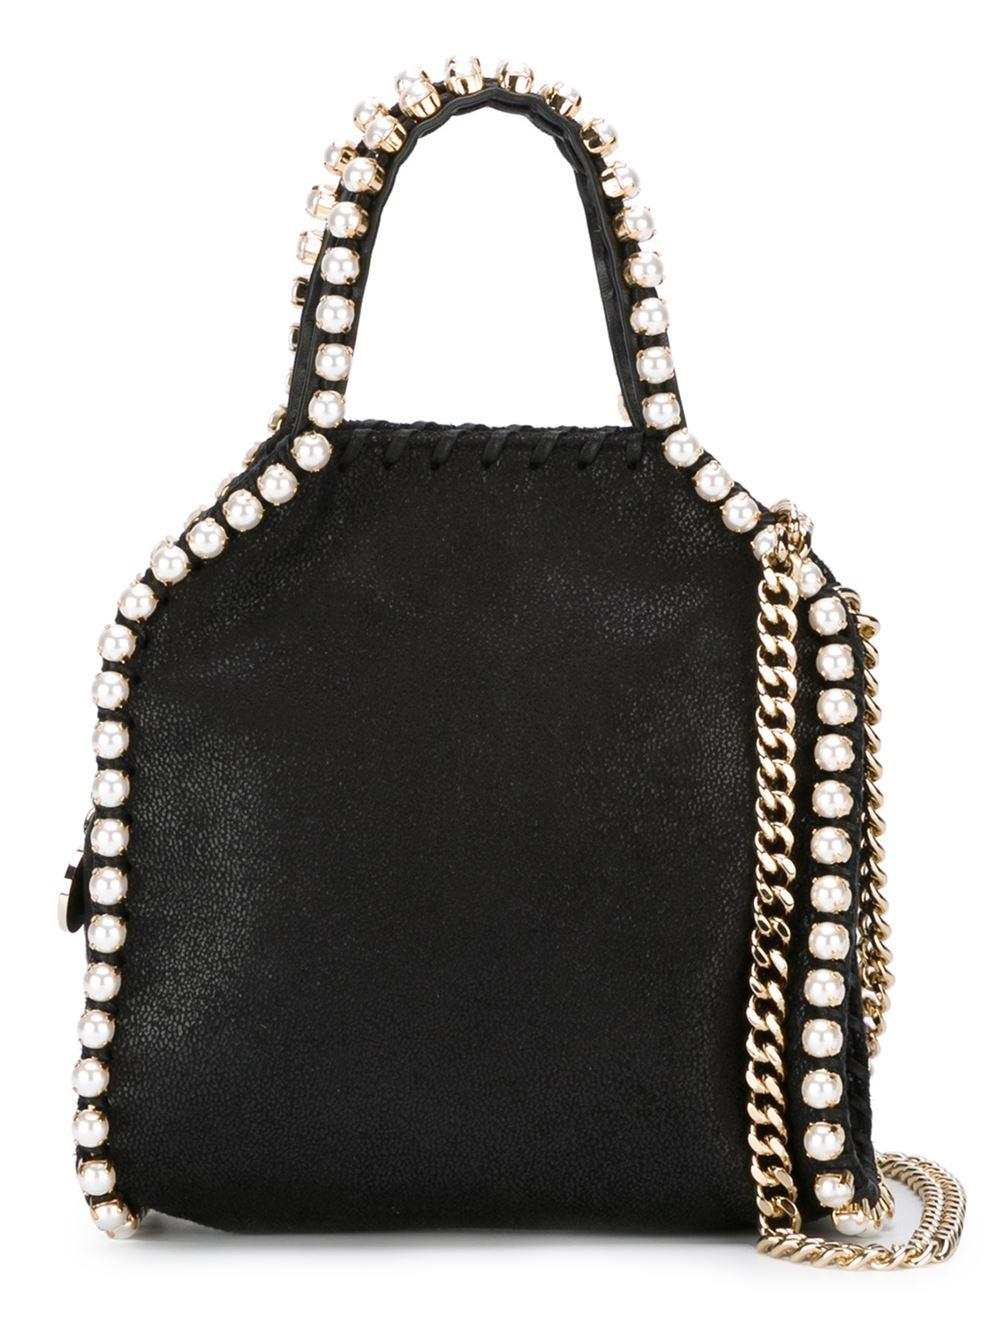 0d2d5f3e84 Stella Mccartney Falabella Tiny Tote Bags